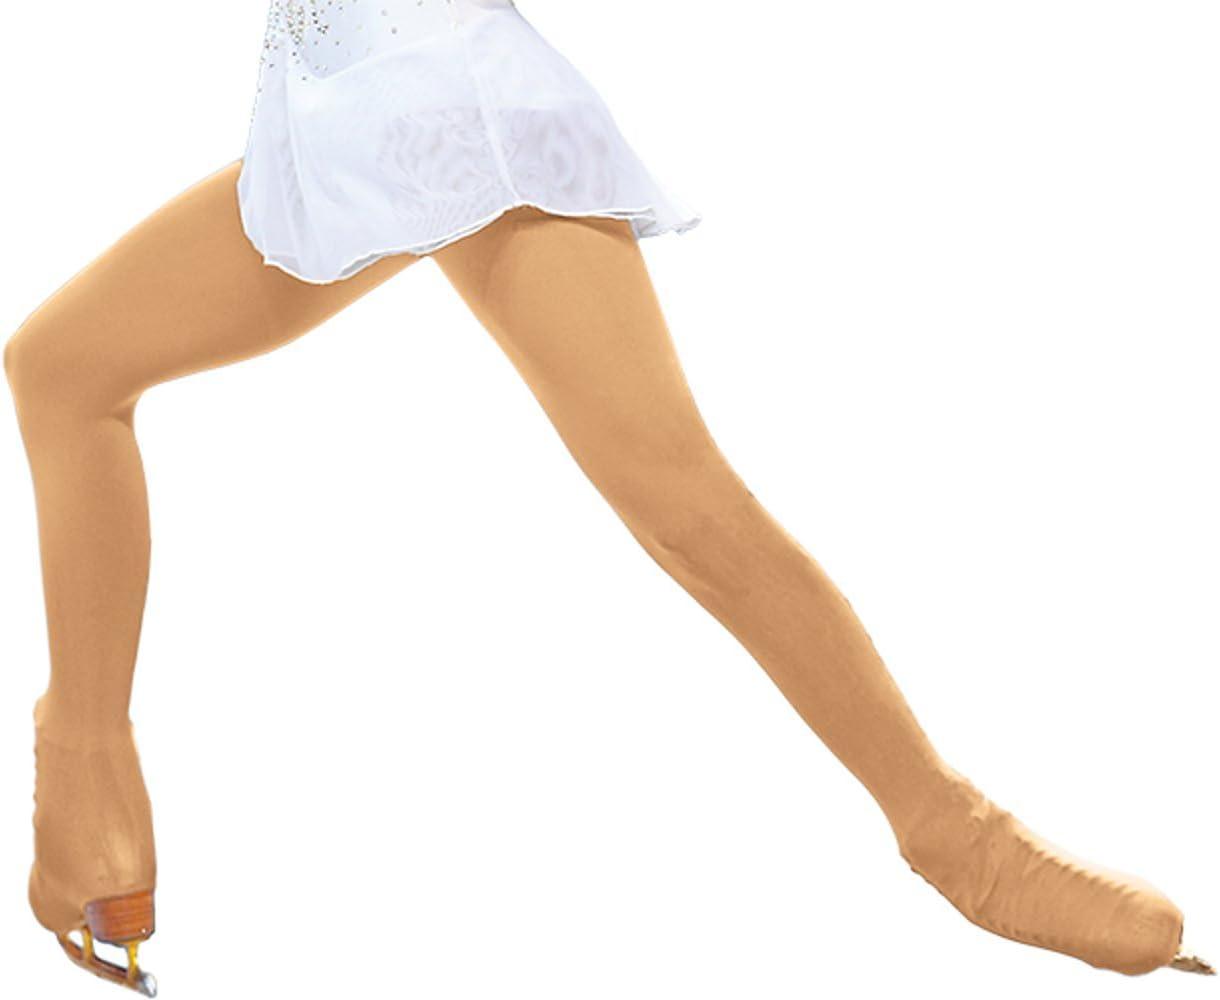 Chloe Noel Figure Skating Medium Tan Over The Boot Tights TB8832 Medium Tan Child Large (10-12)